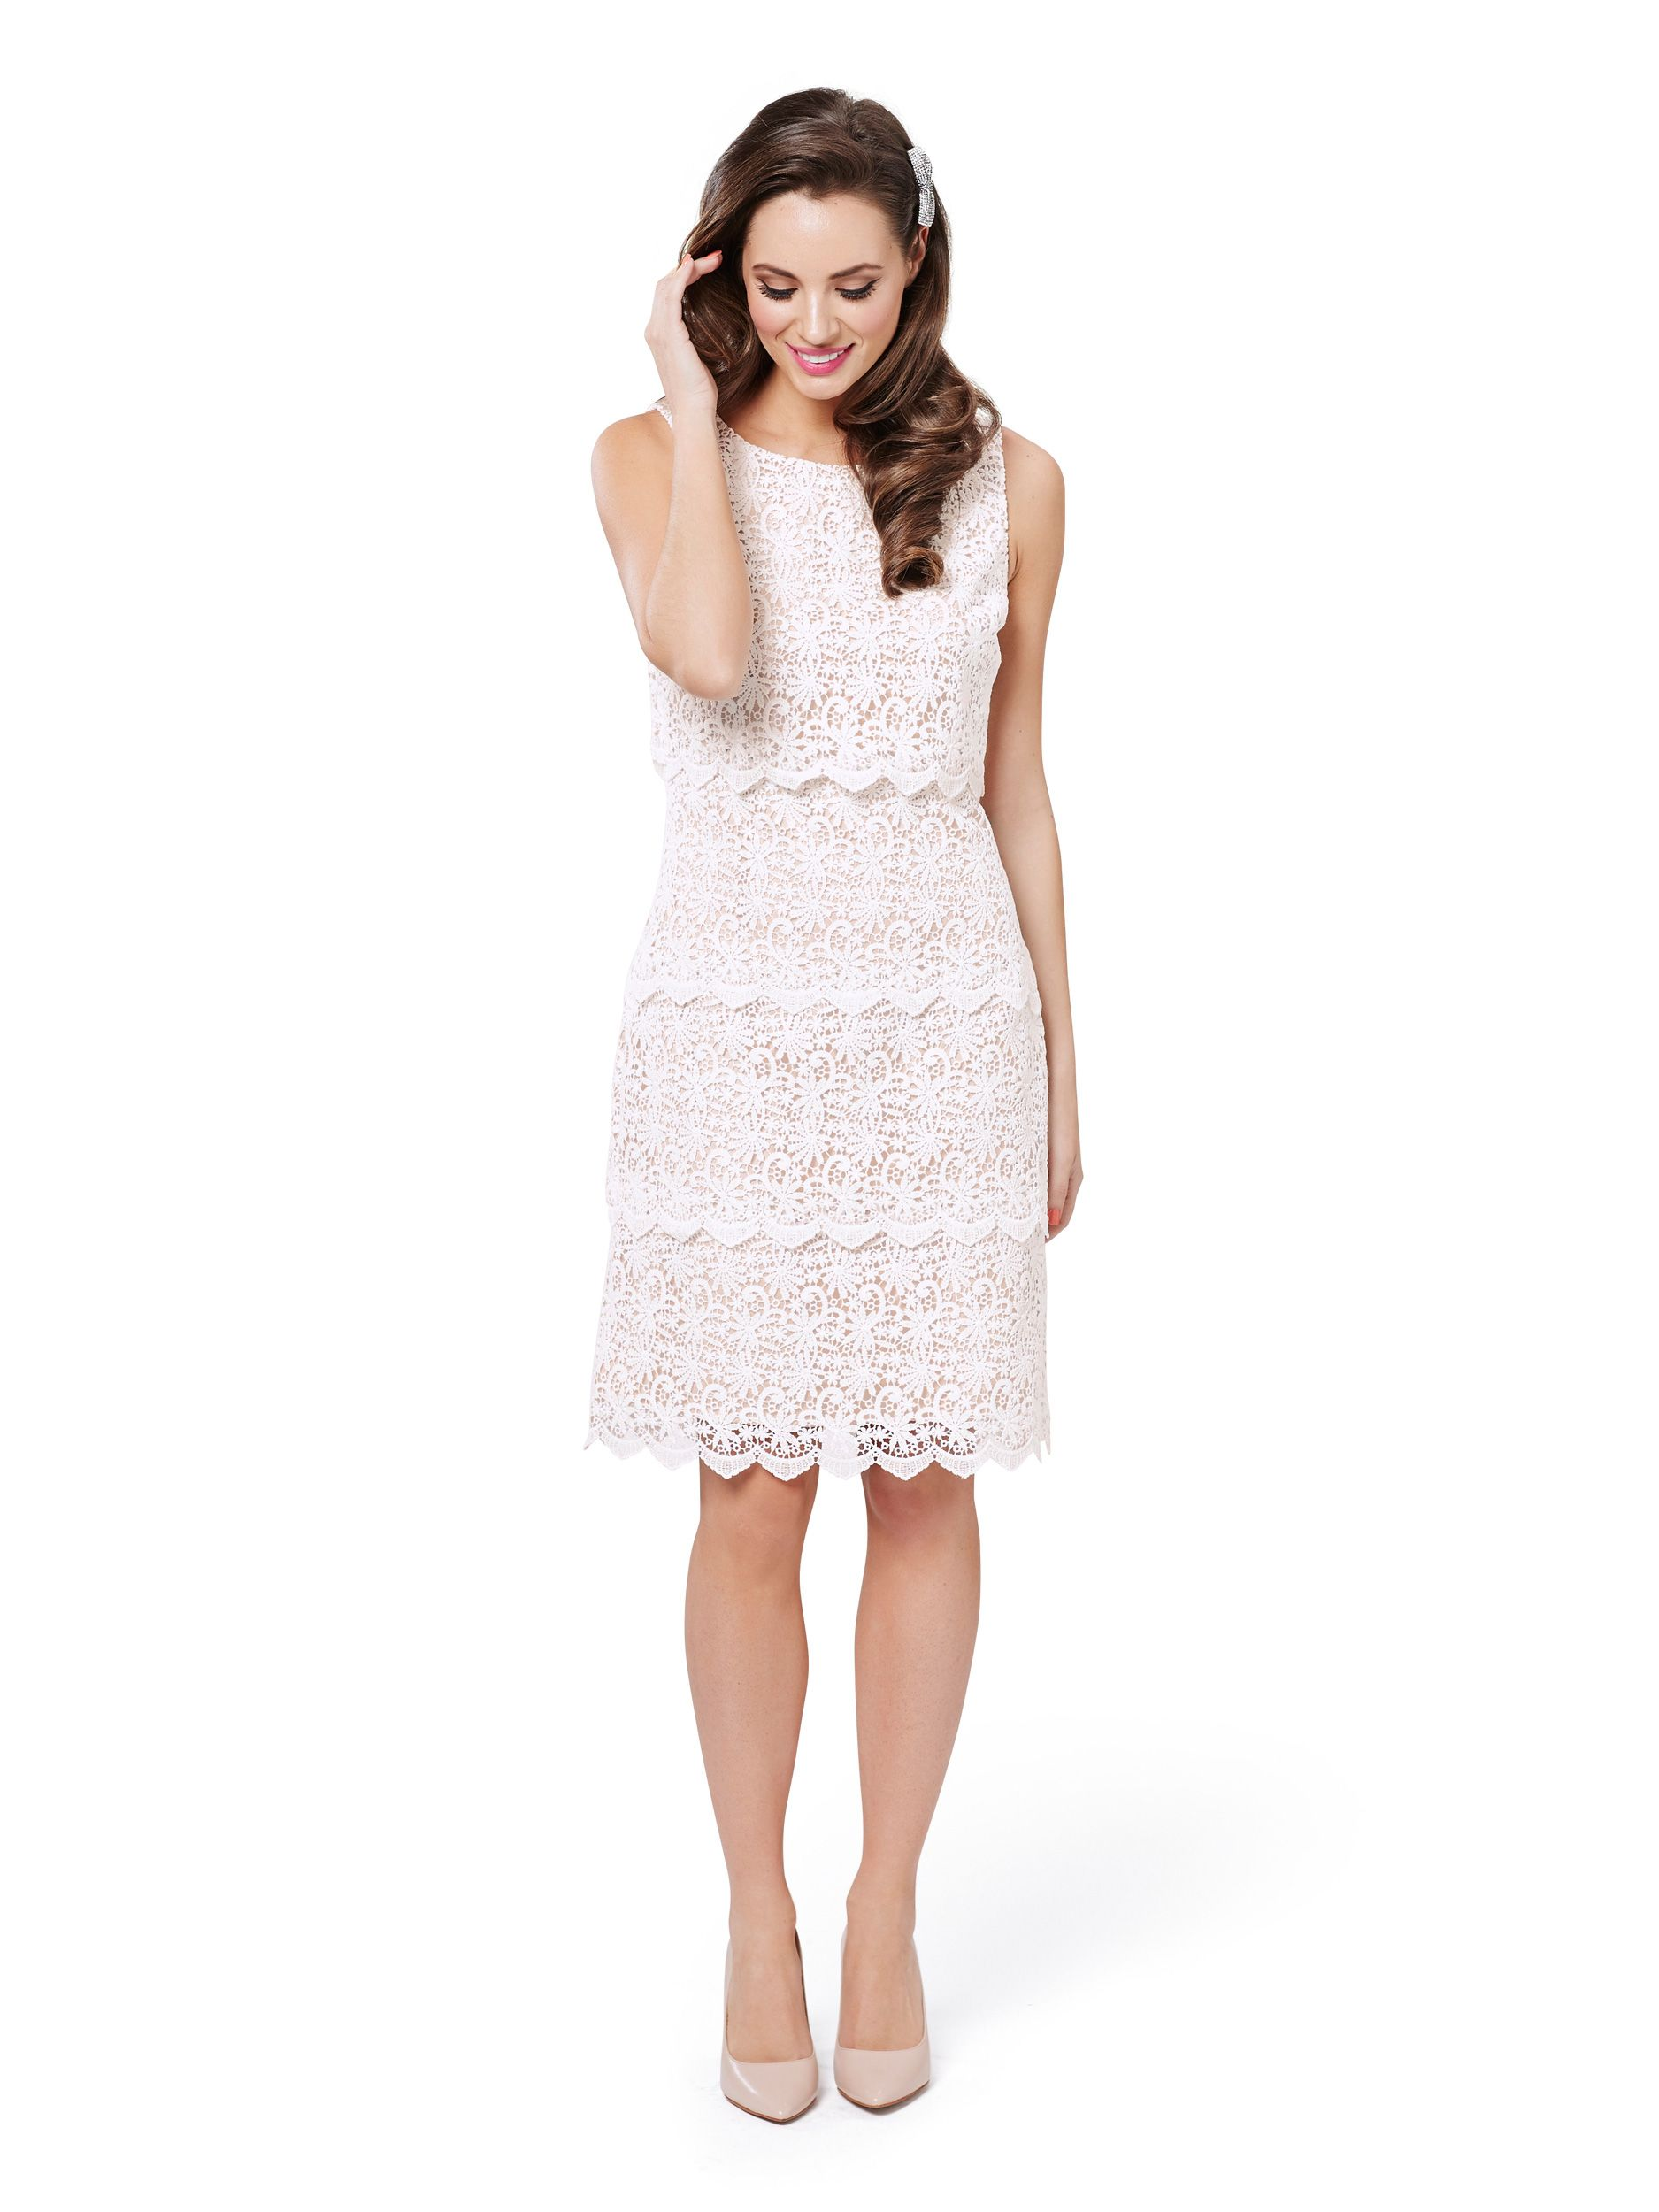 46a1dd0144d1 Moonflower Dress | Cream and Nude | Dresses | Autumn/Winter 2017